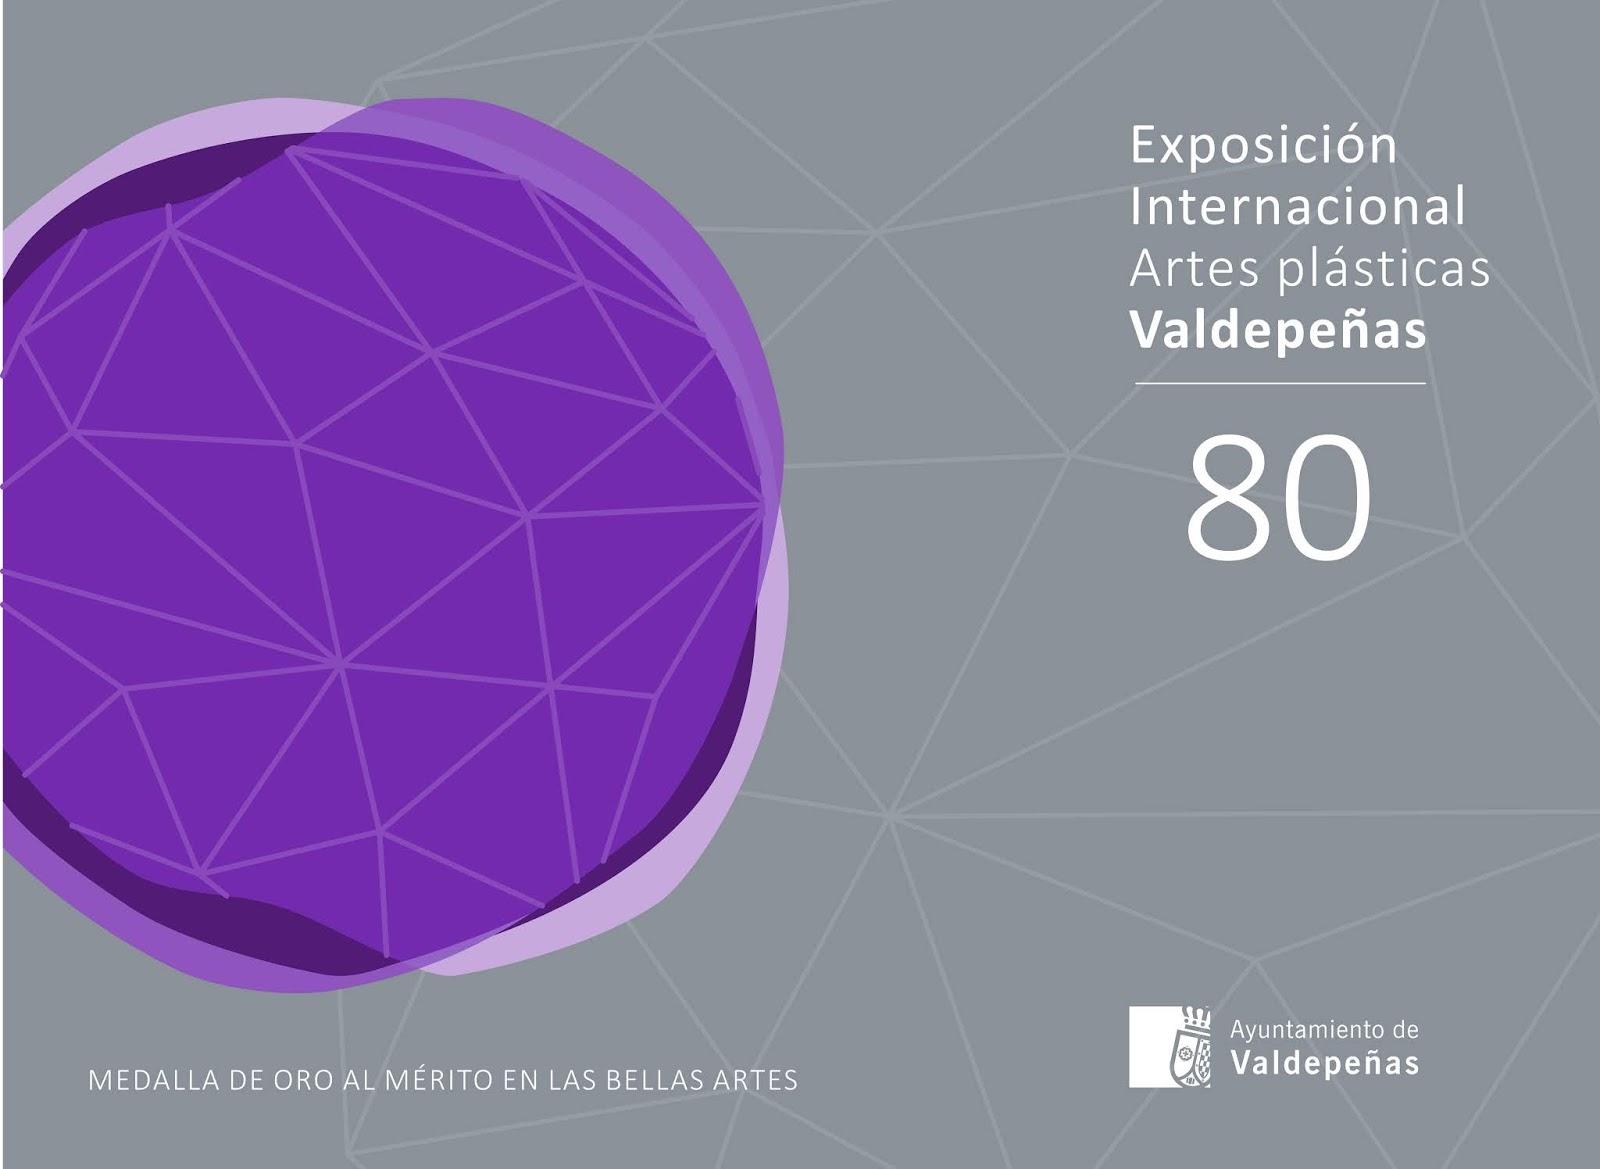 80 Exposición Internacional Artes Plásticas Valdepeñas